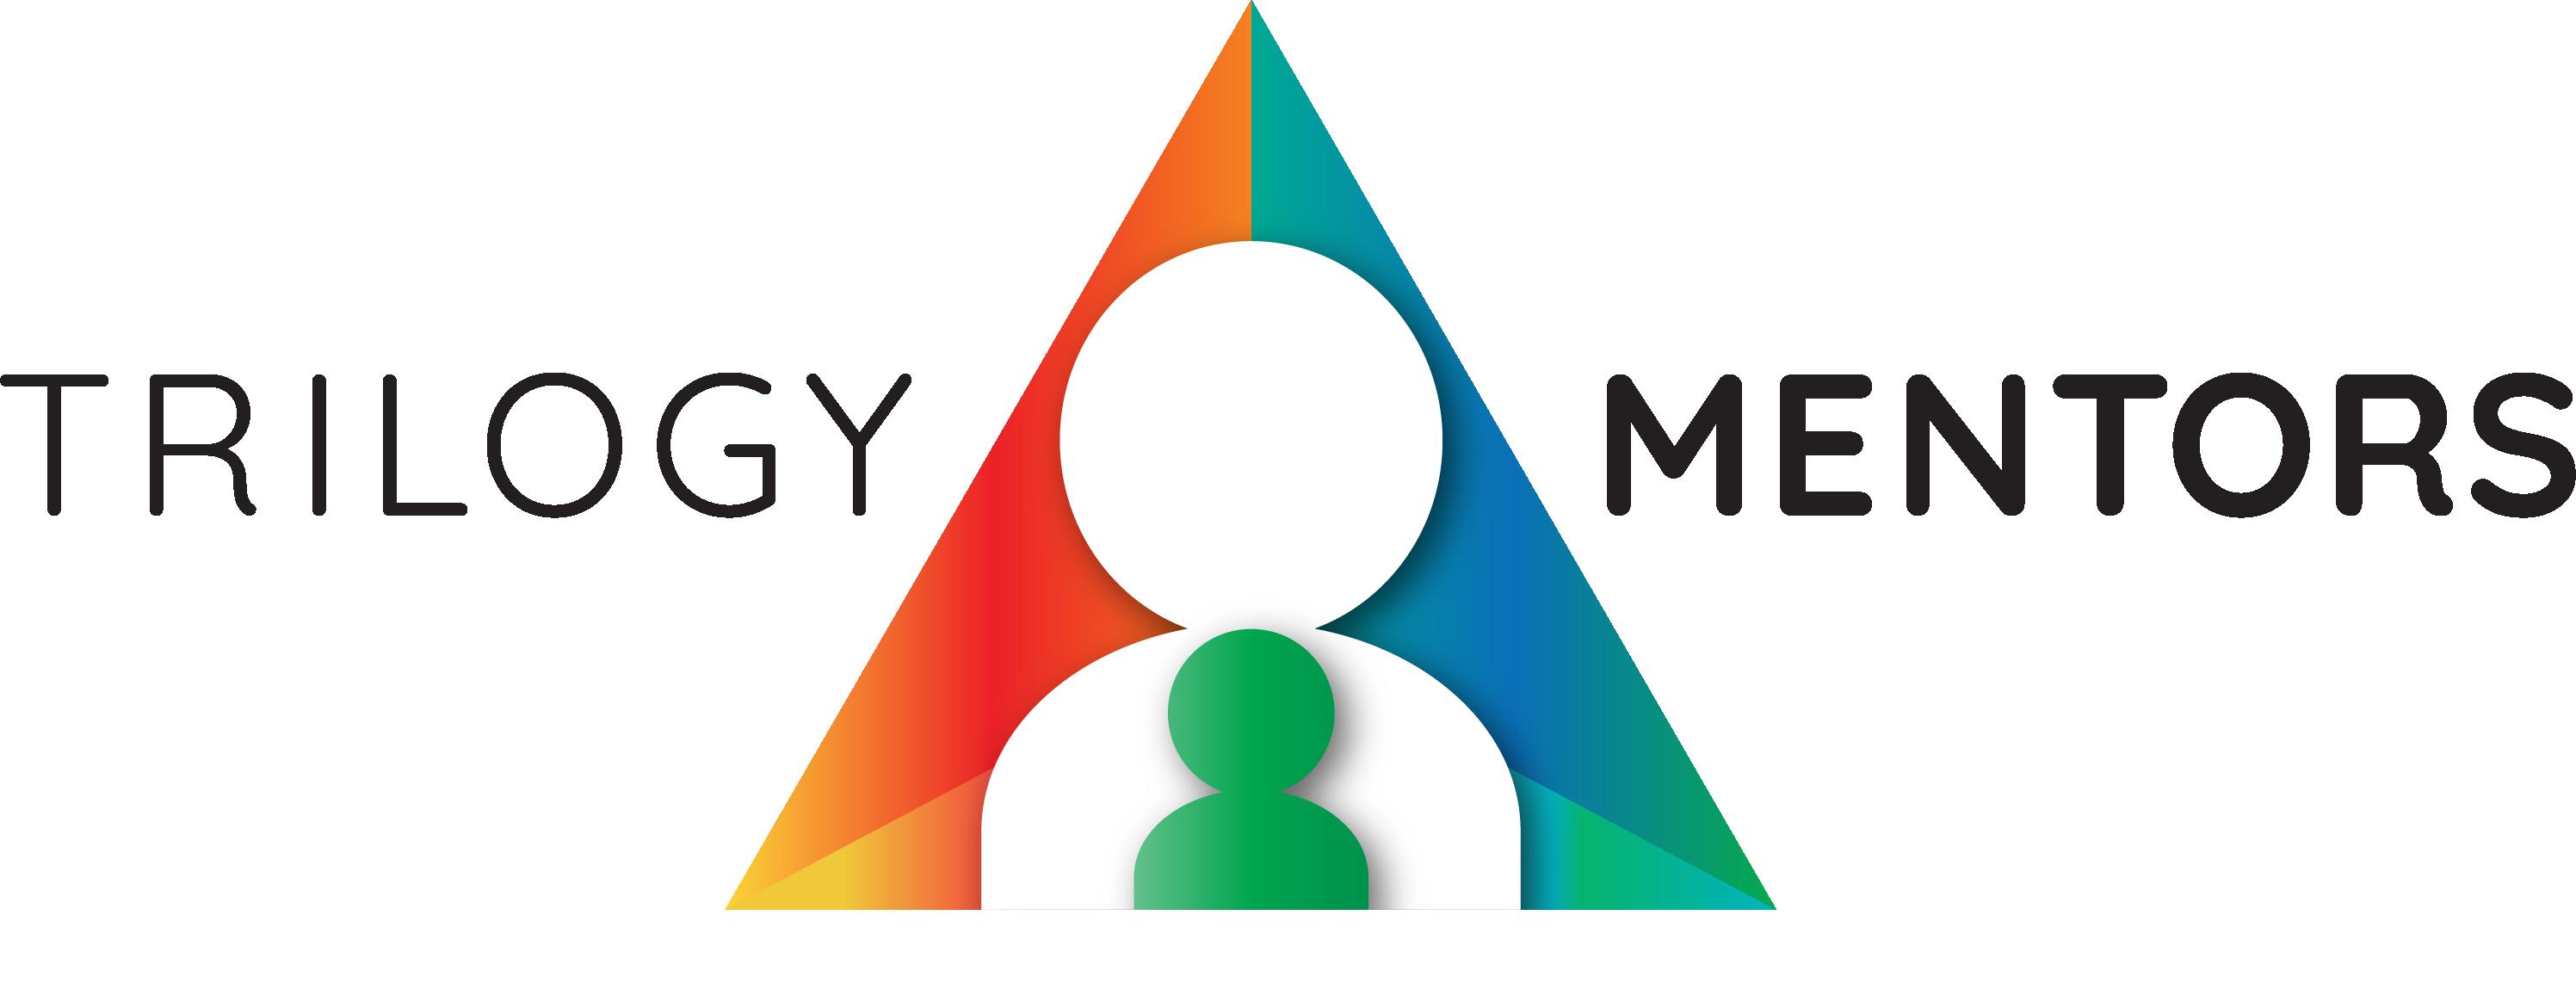 Trilogy Mentors logo